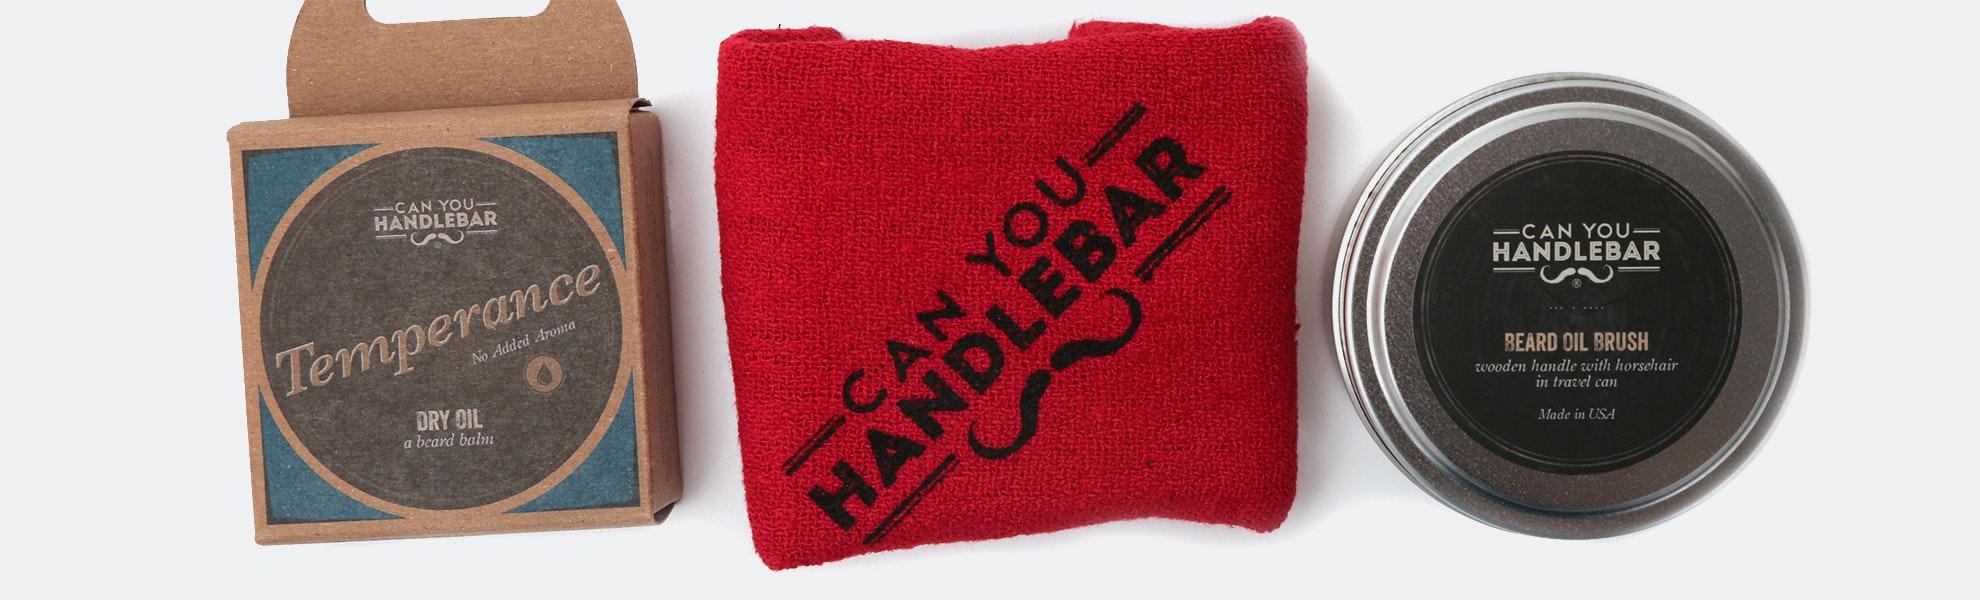 Can You Handlebar Beard Care Kit